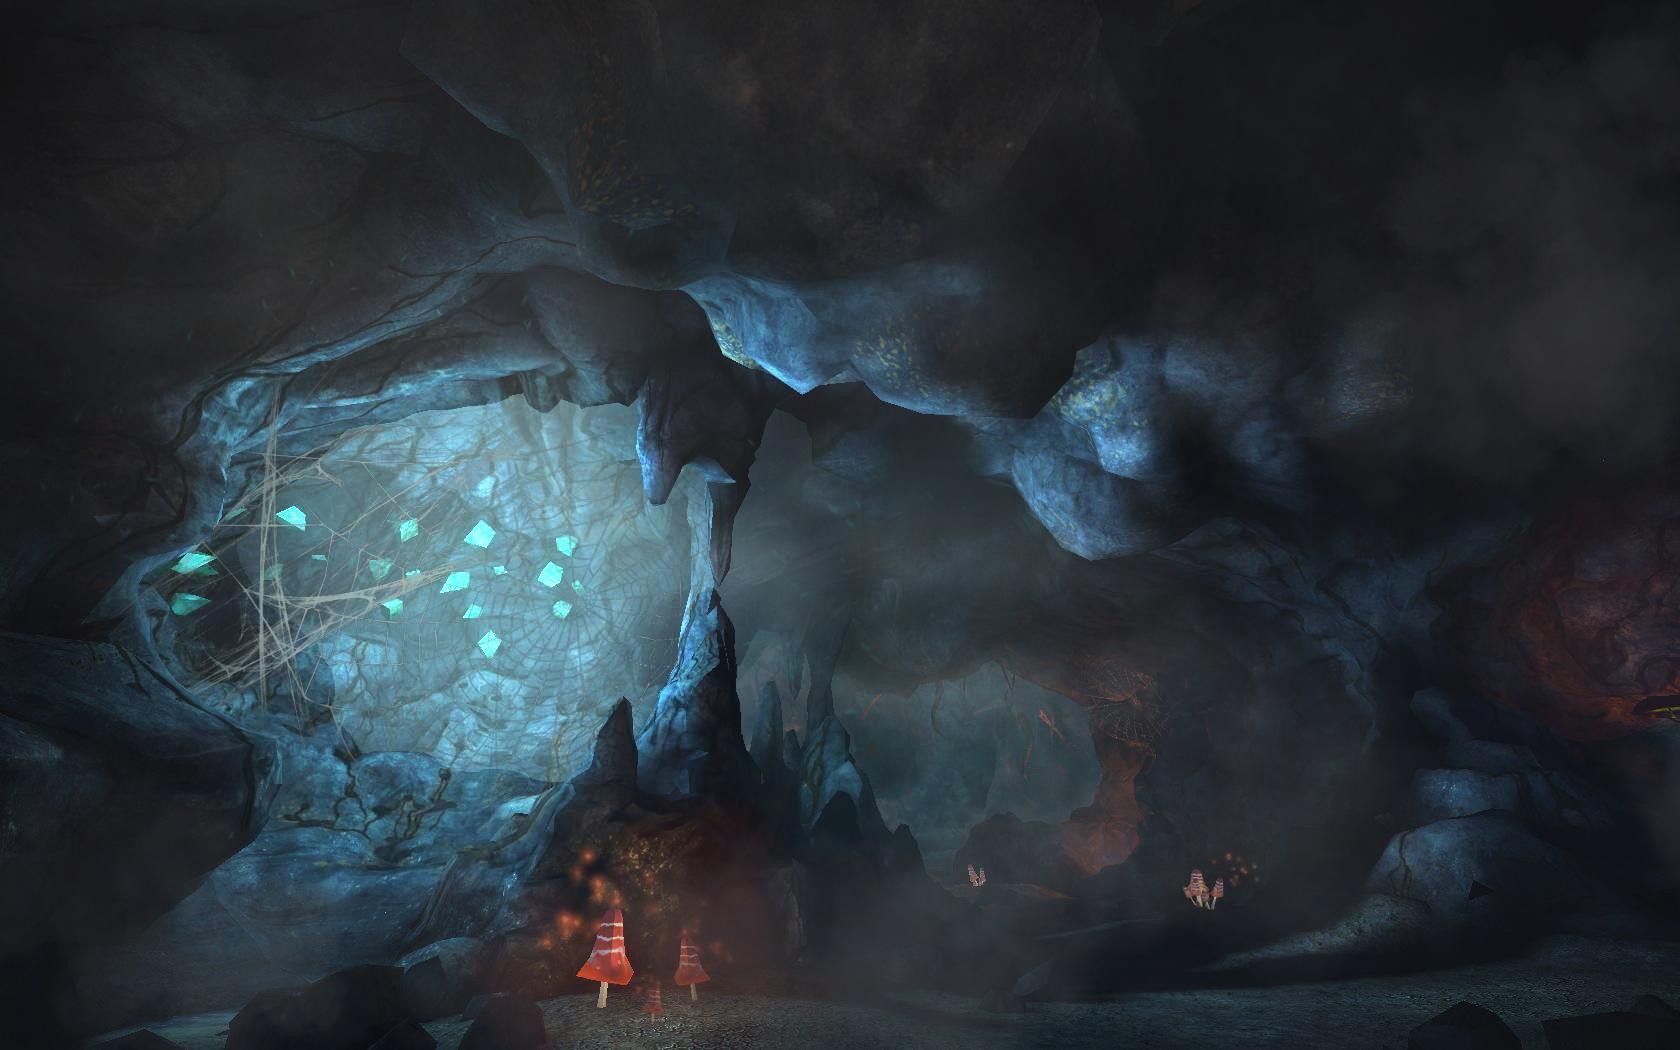 pre_1547149825__mmxl_spider-cavern.jpg